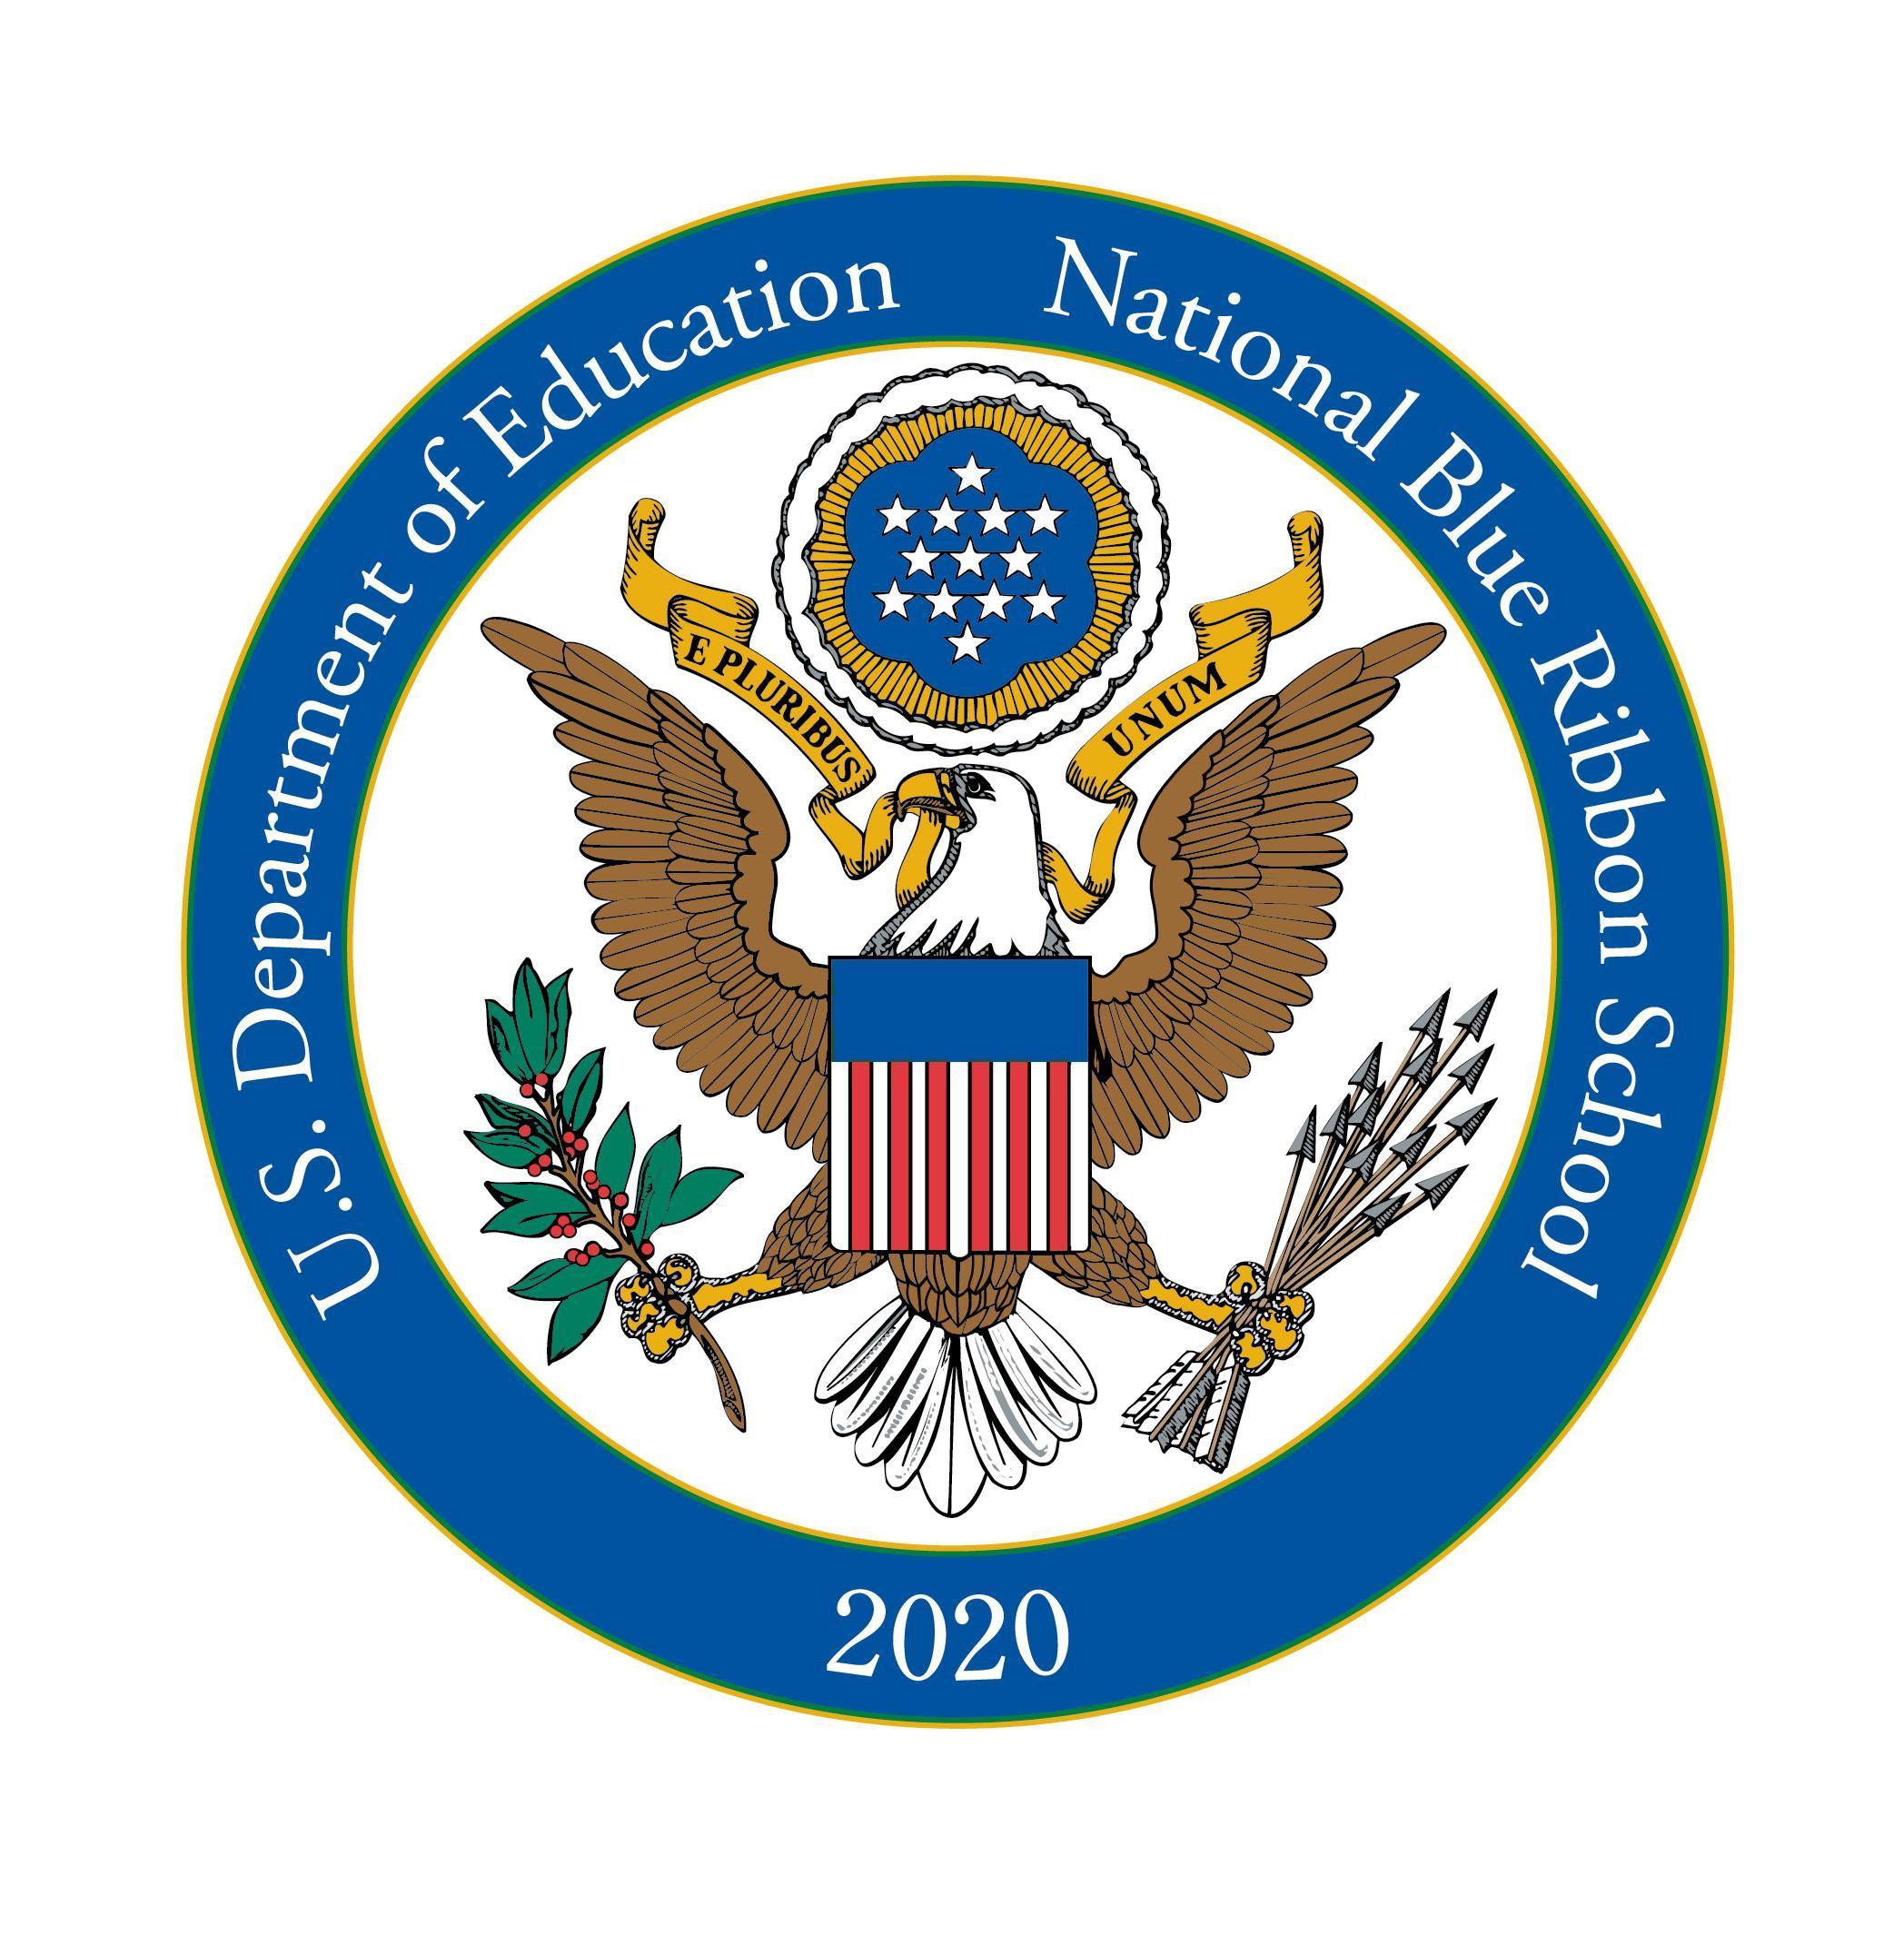 National Blue Ribbon symbol